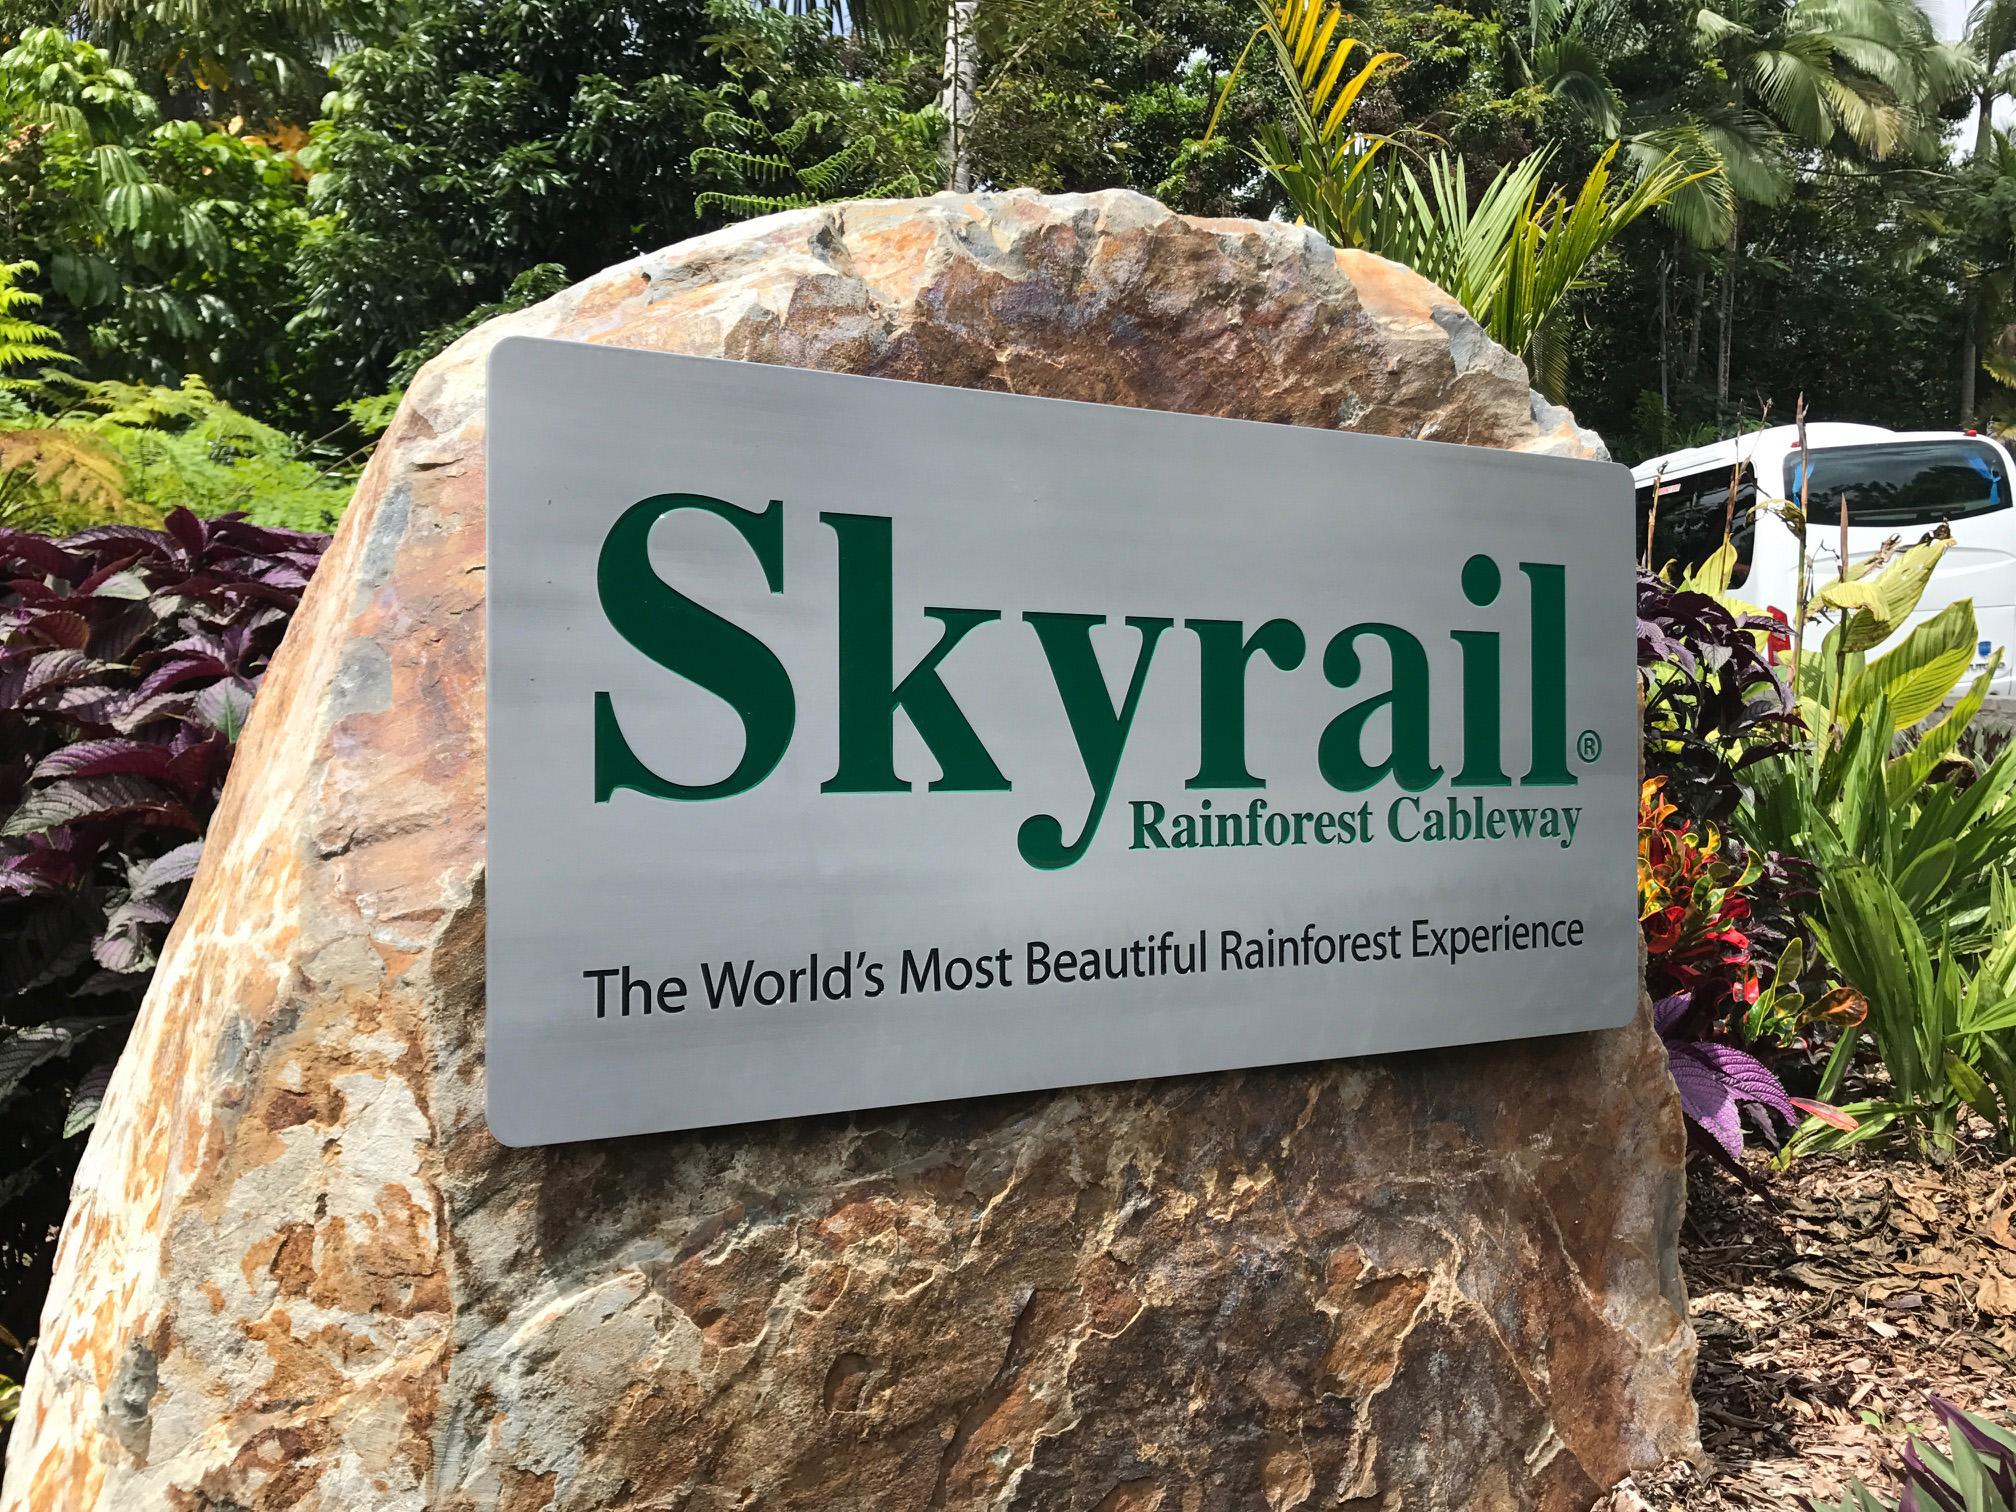 Skyrail aluminium sign